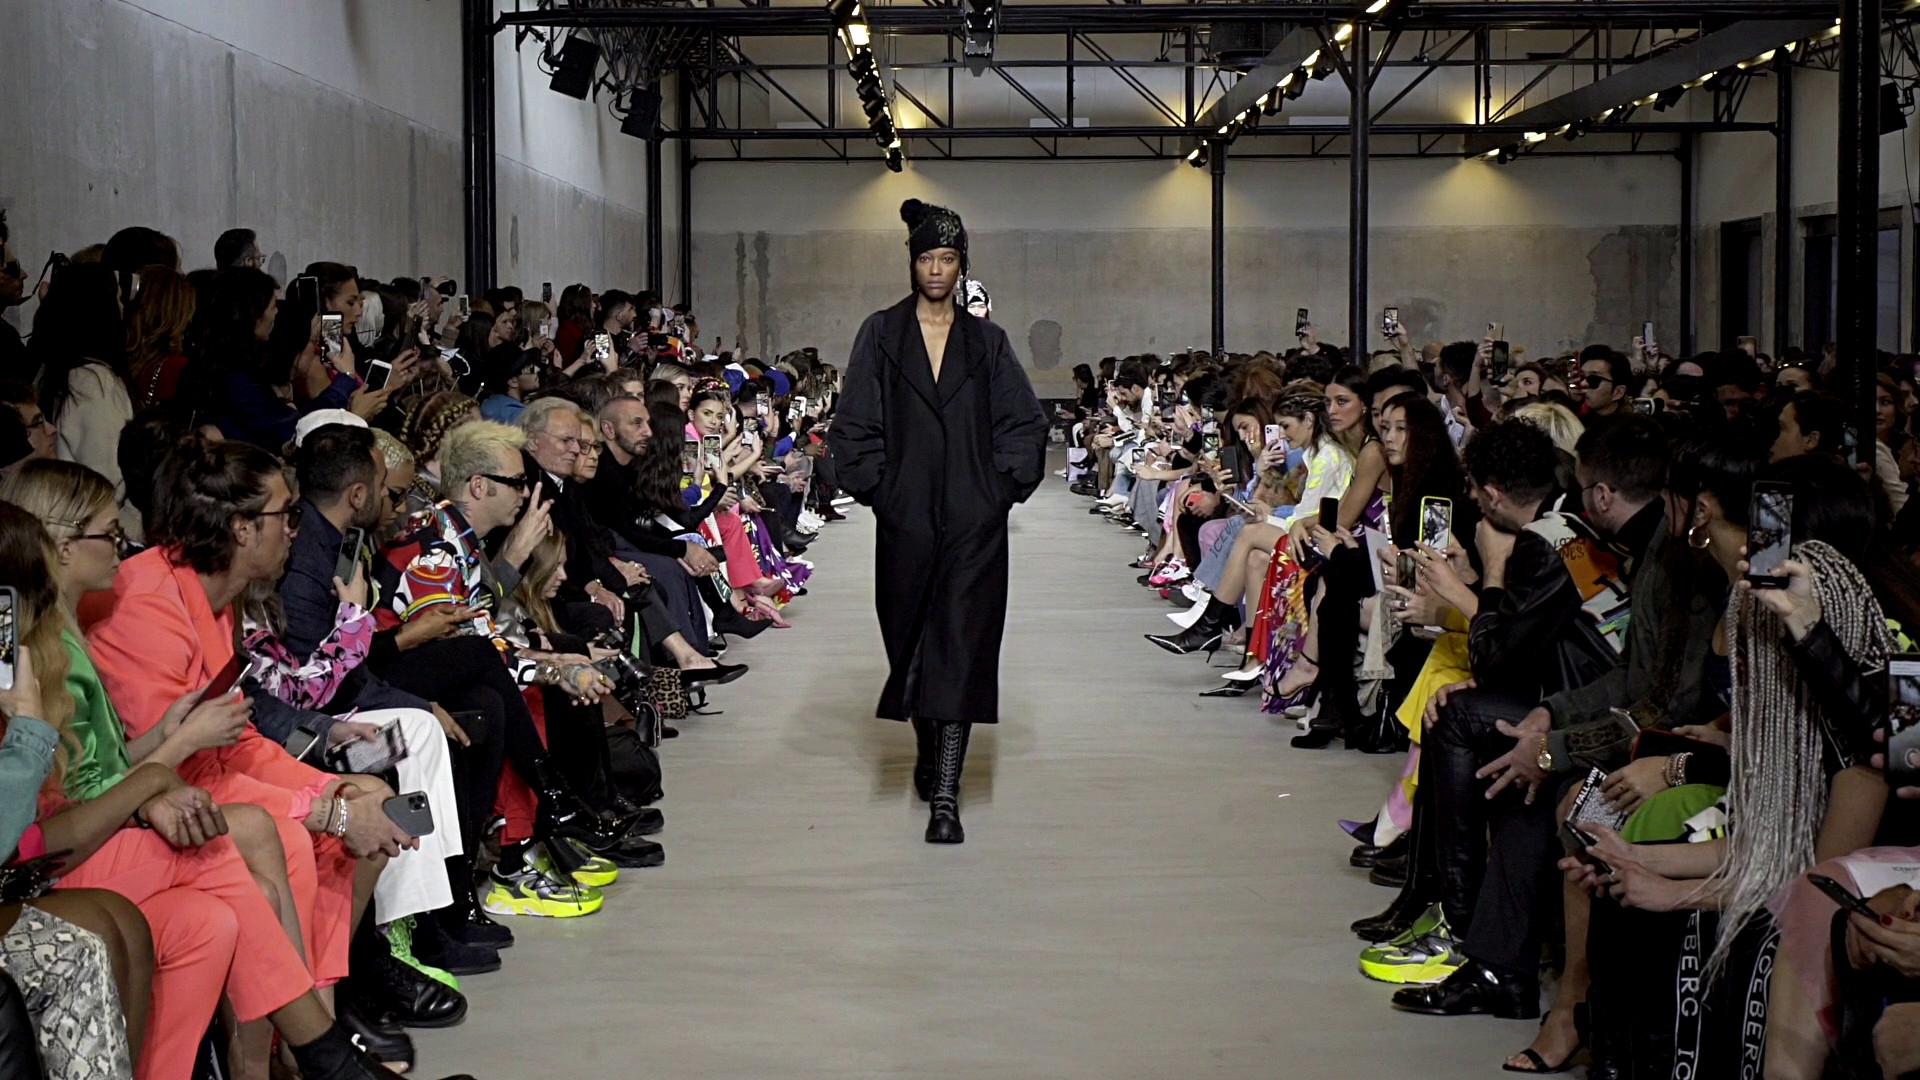 Iceberg Fall Winter 2020 Women's Fashion Show - Milan Fashion Week